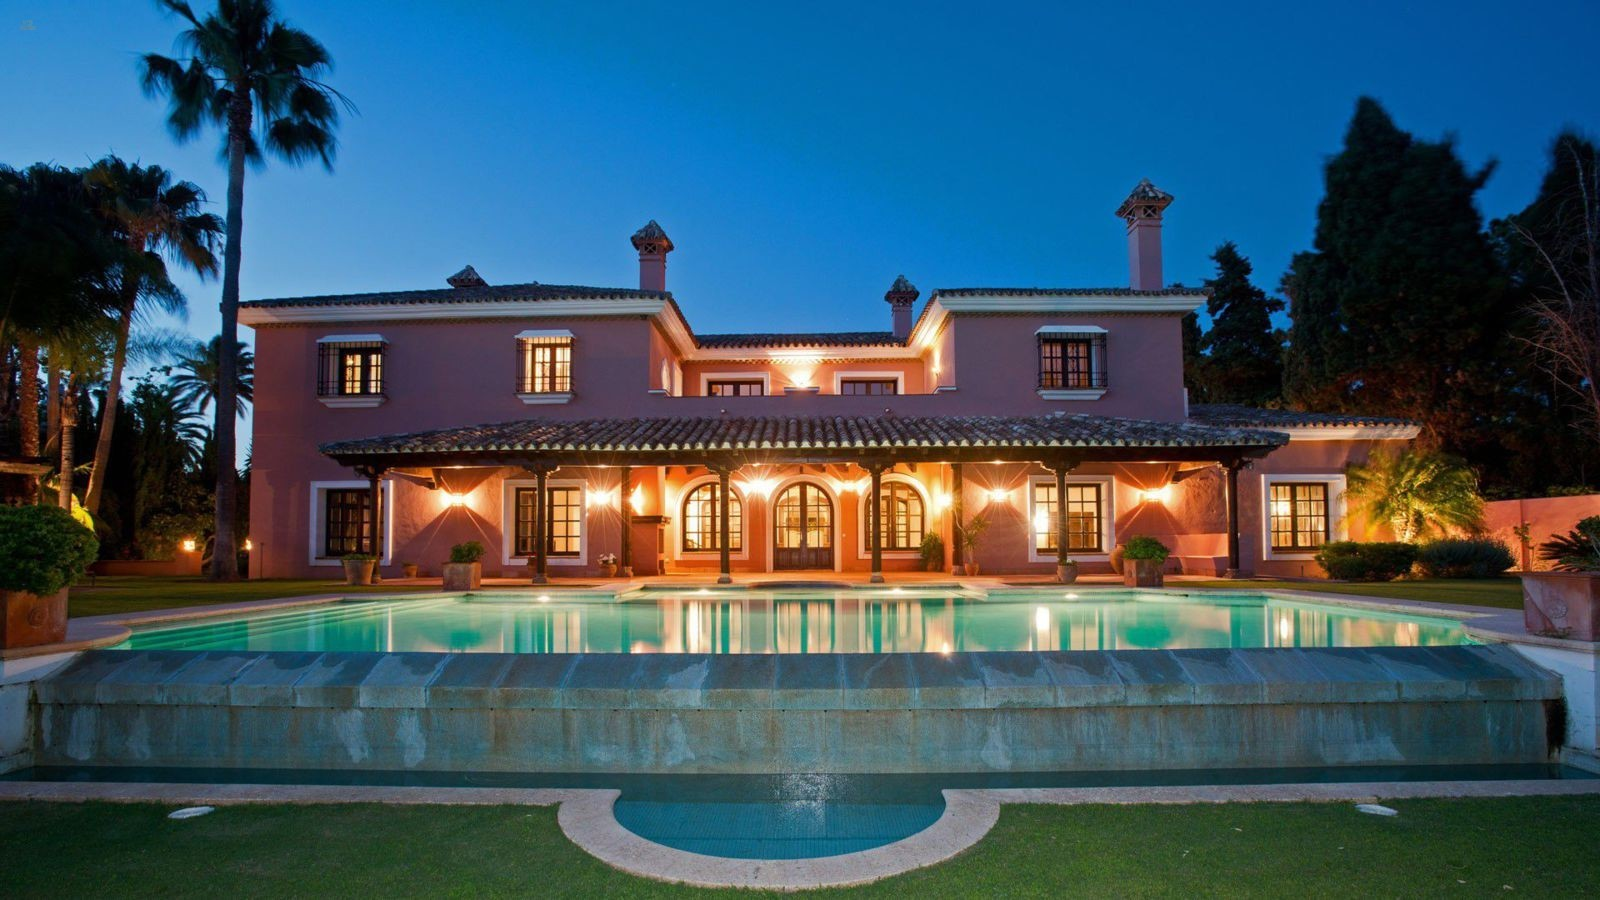 Luxus-Villa Guadalmina Baja Costa del Sol R2763293